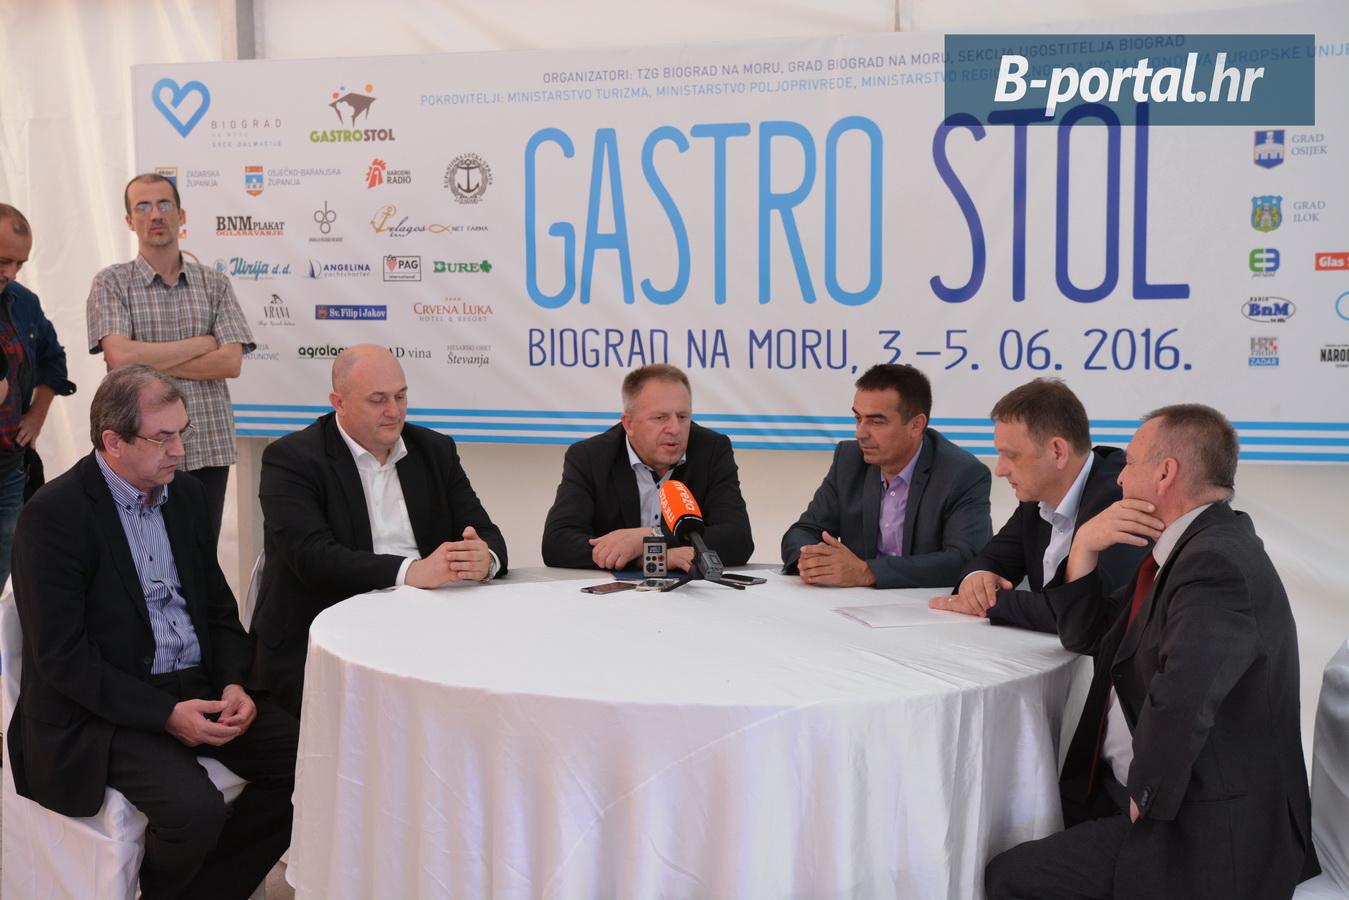 gastro-stol-2016-2